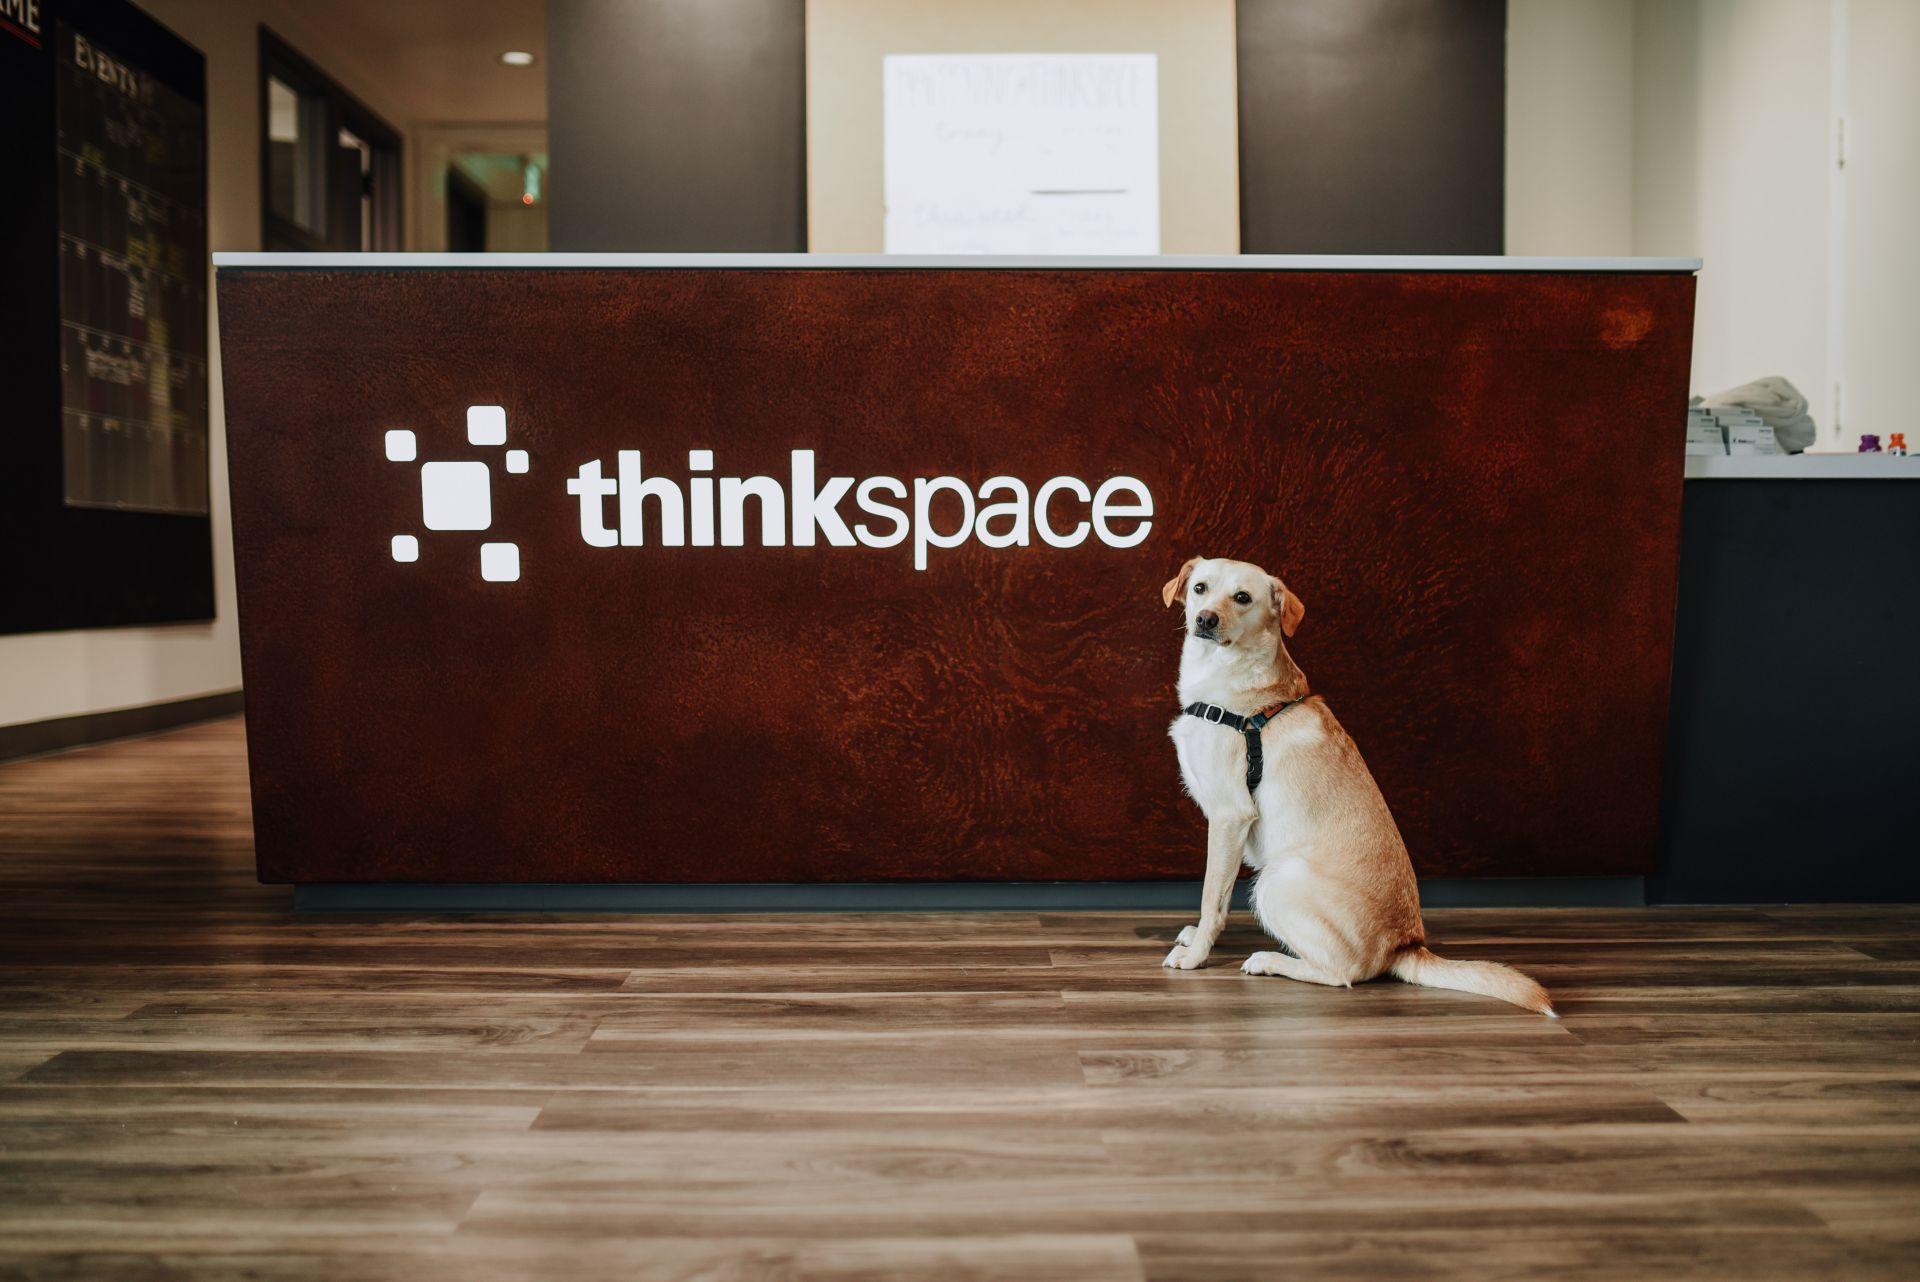 thinkspace, Seattle